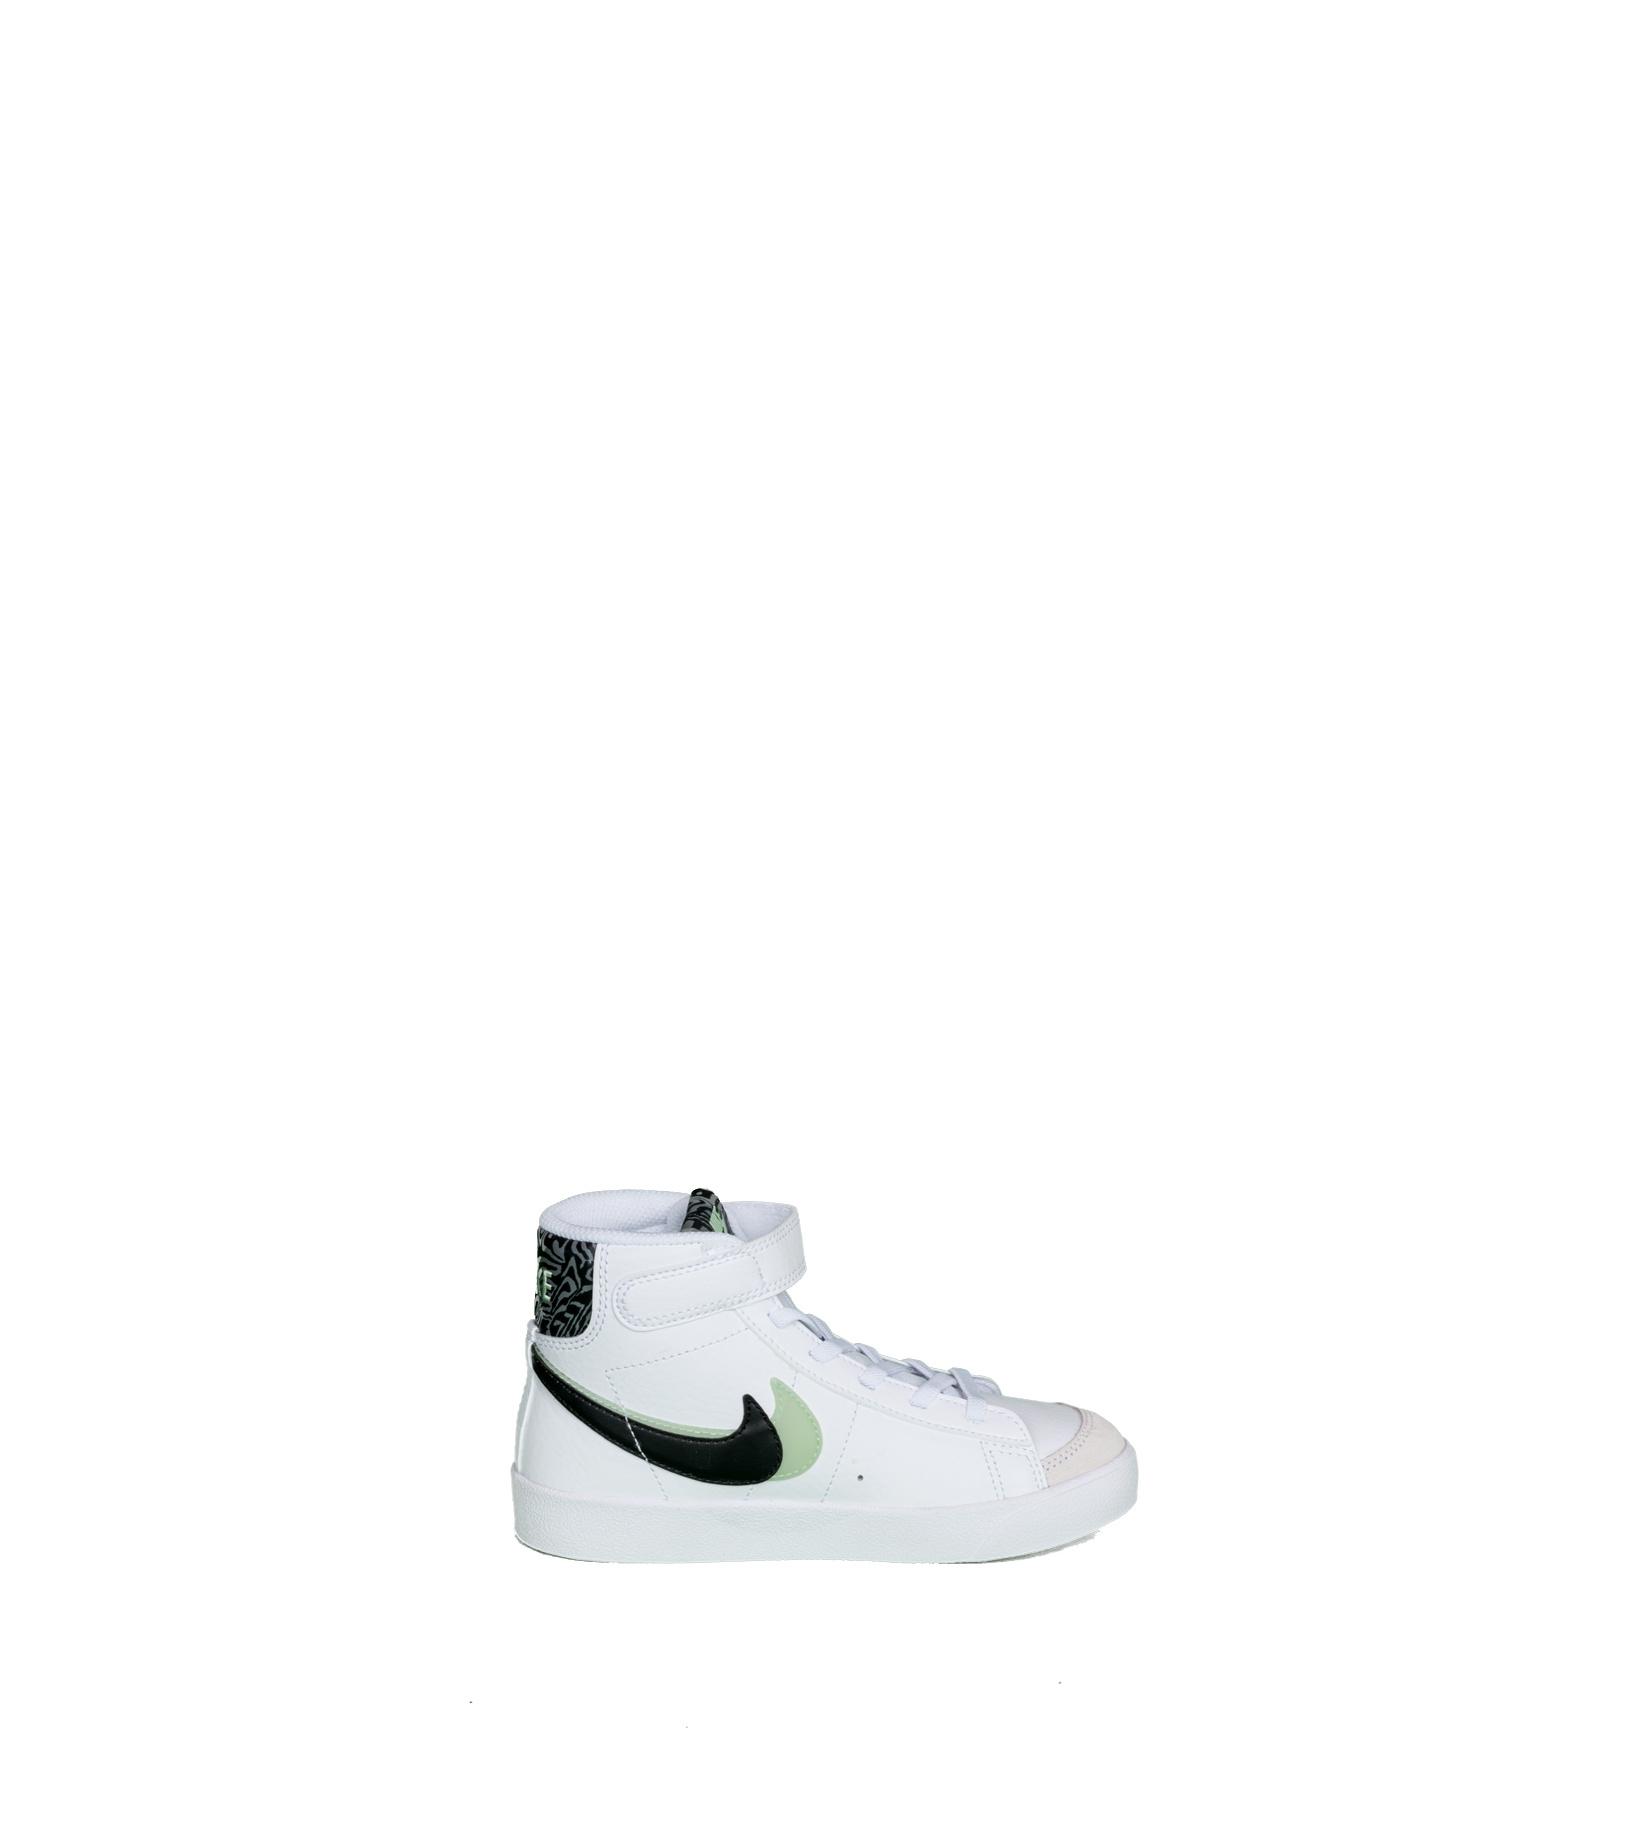 "Blazer Mid '77 SE (PS)  ""White/Vapor Green""-4"